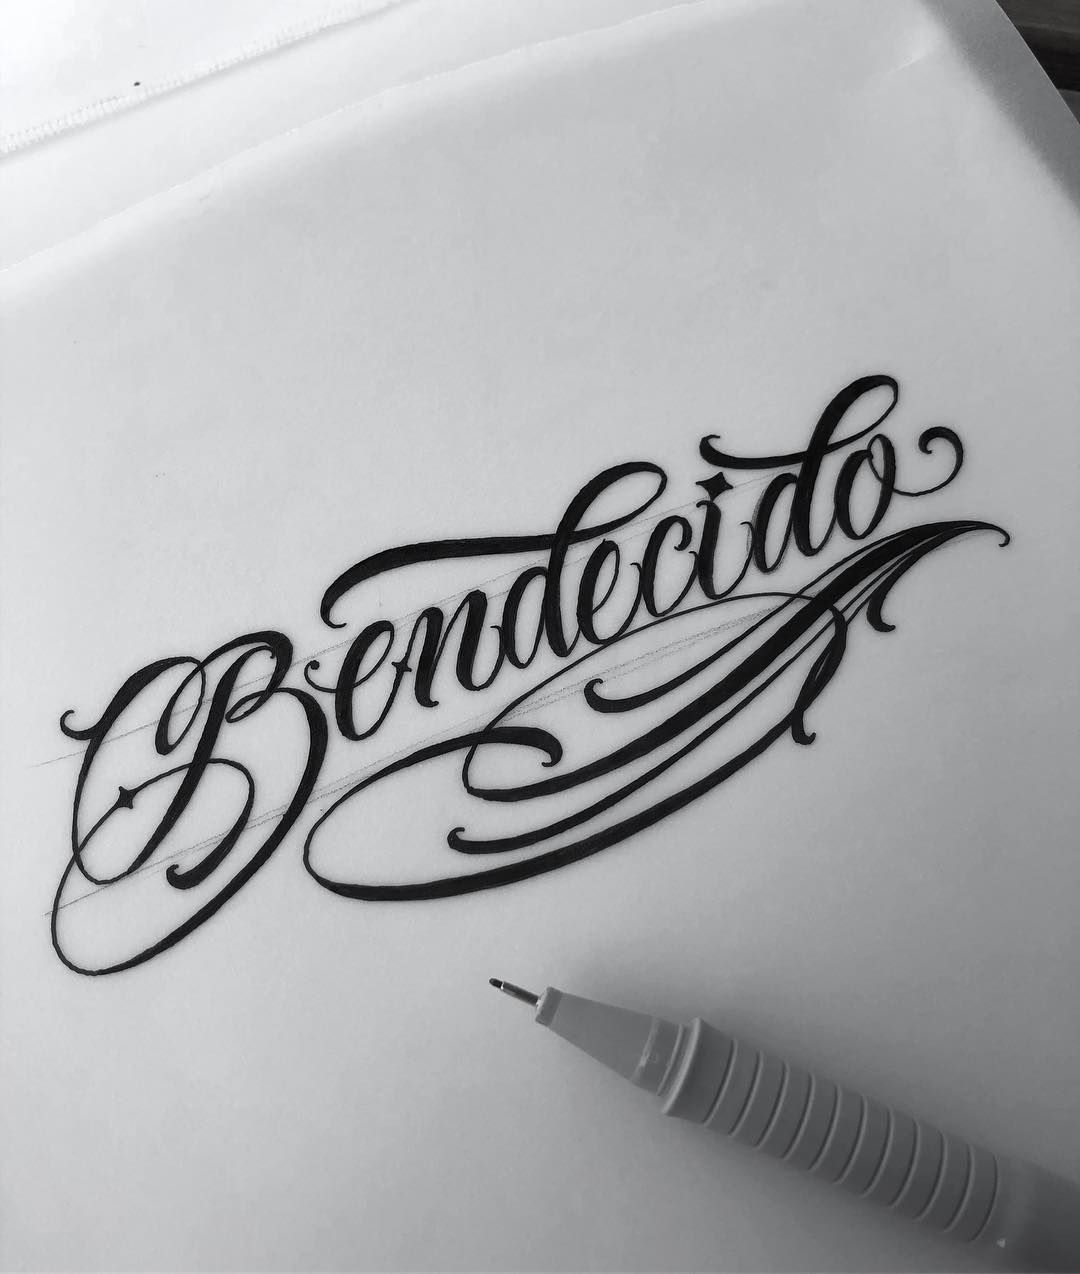 21 Letras para tatuajes 2018